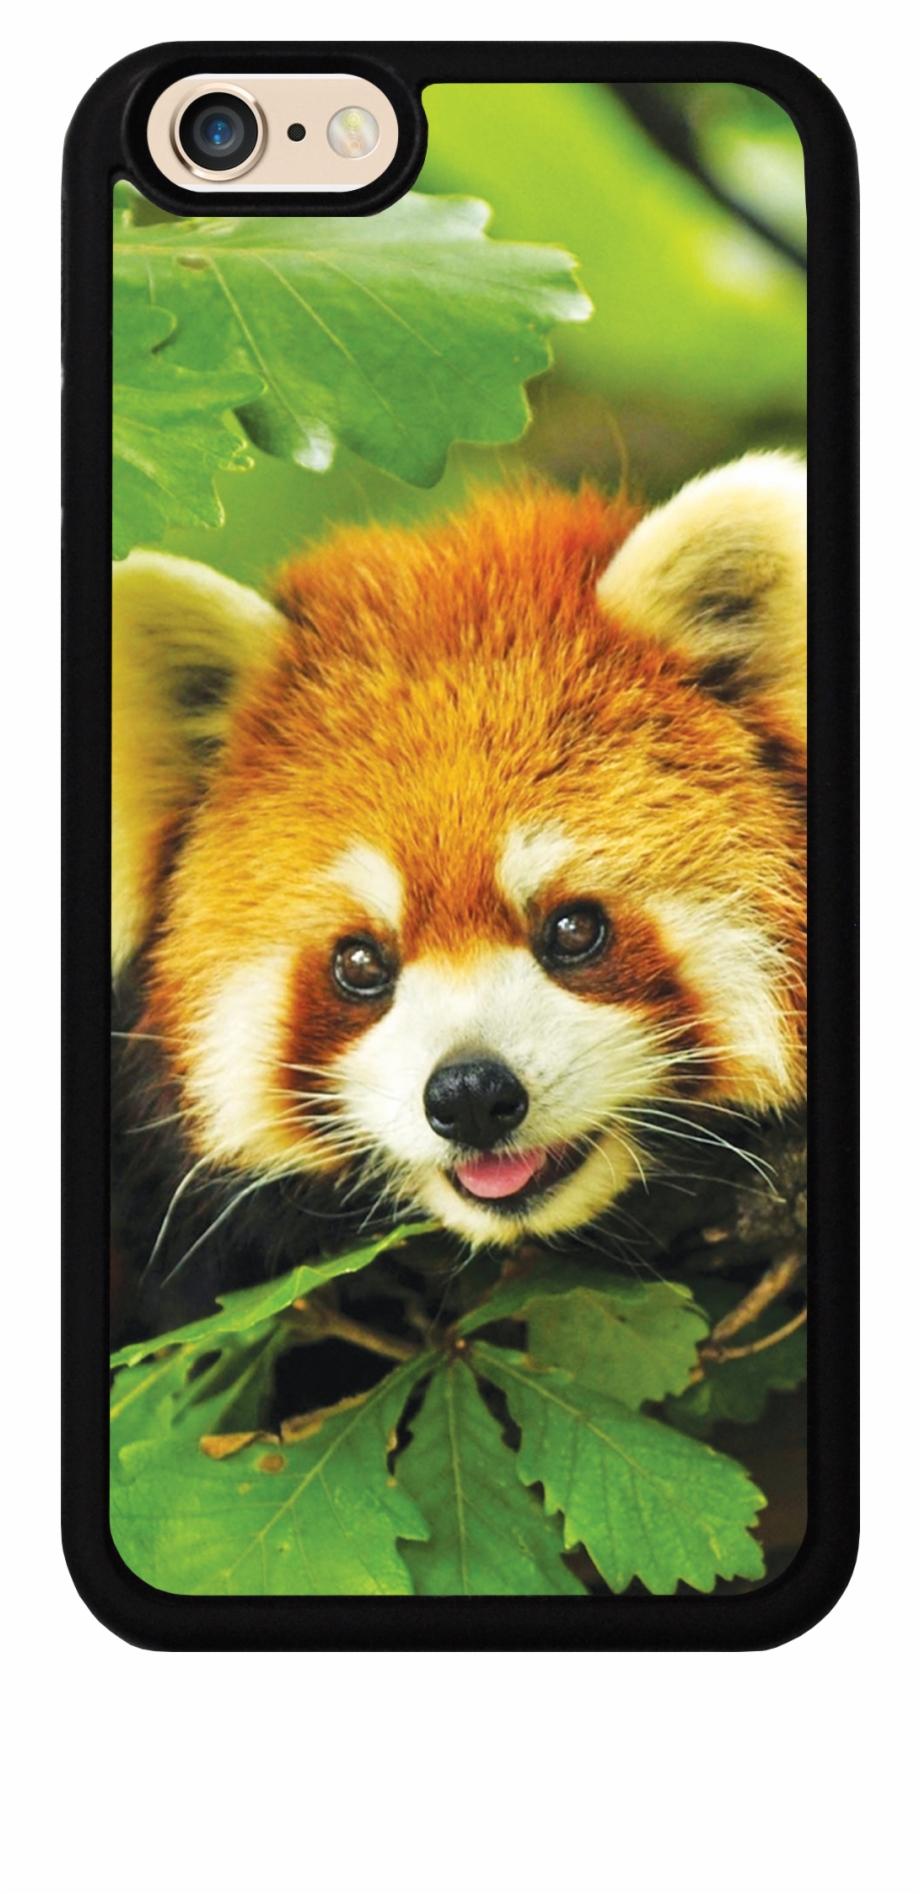 Free Download Red Panda Cute For Ipod Red Panda Wallpaper Hd